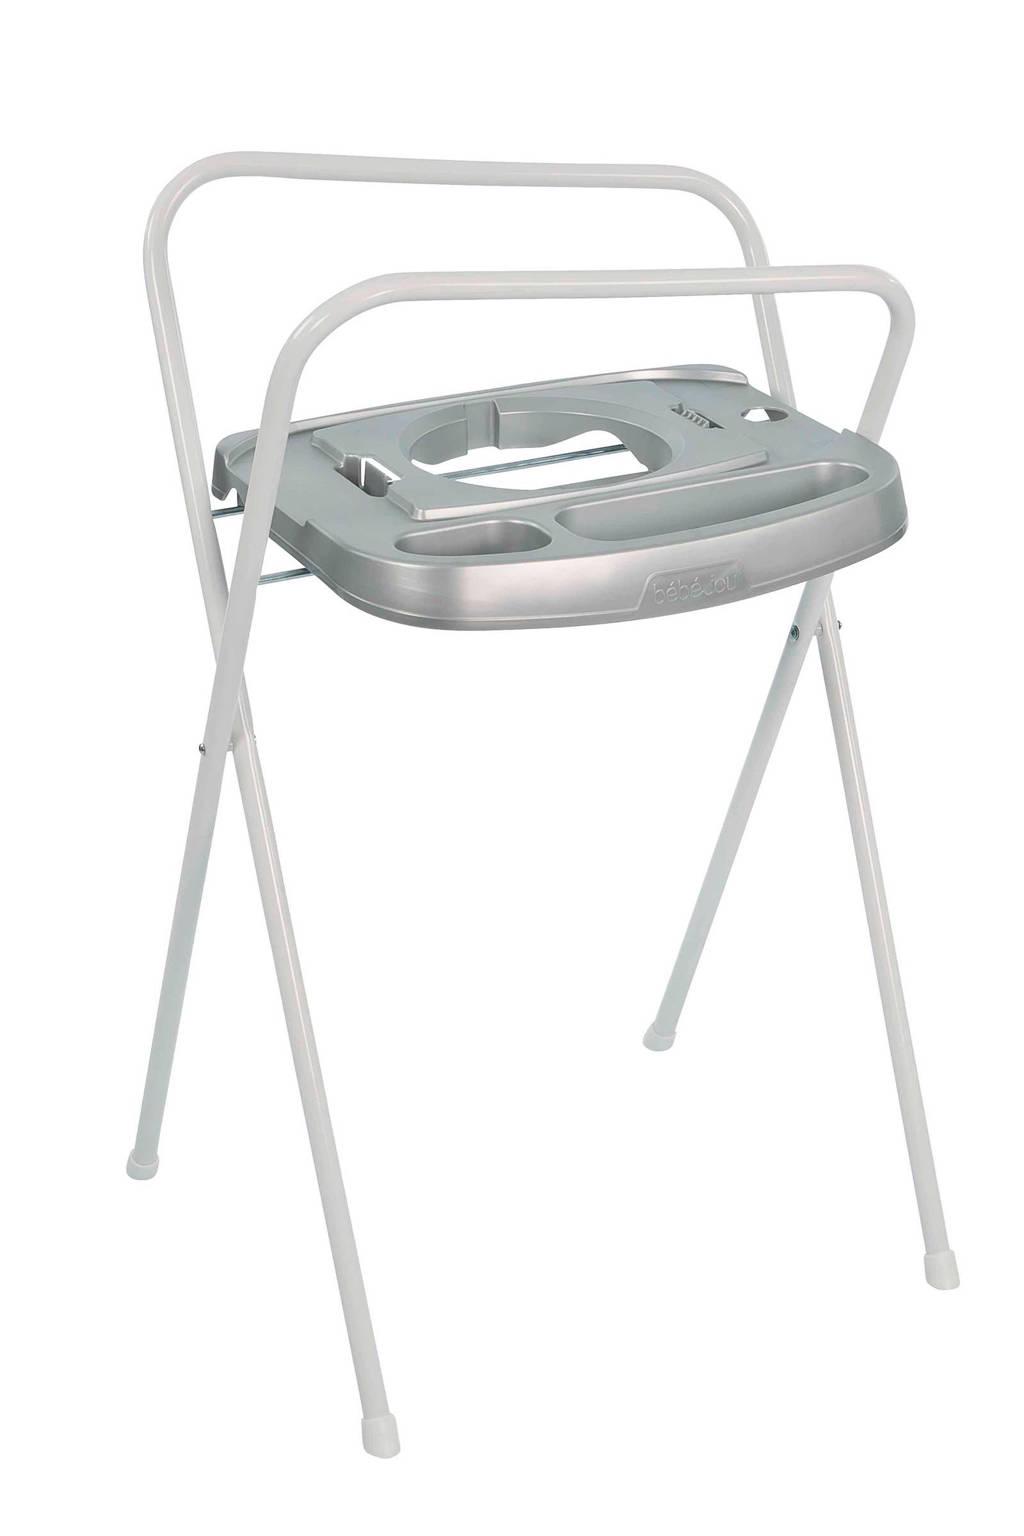 bébé-jou Click Badstandaard 2205 (103 cm) zilver, Zilver